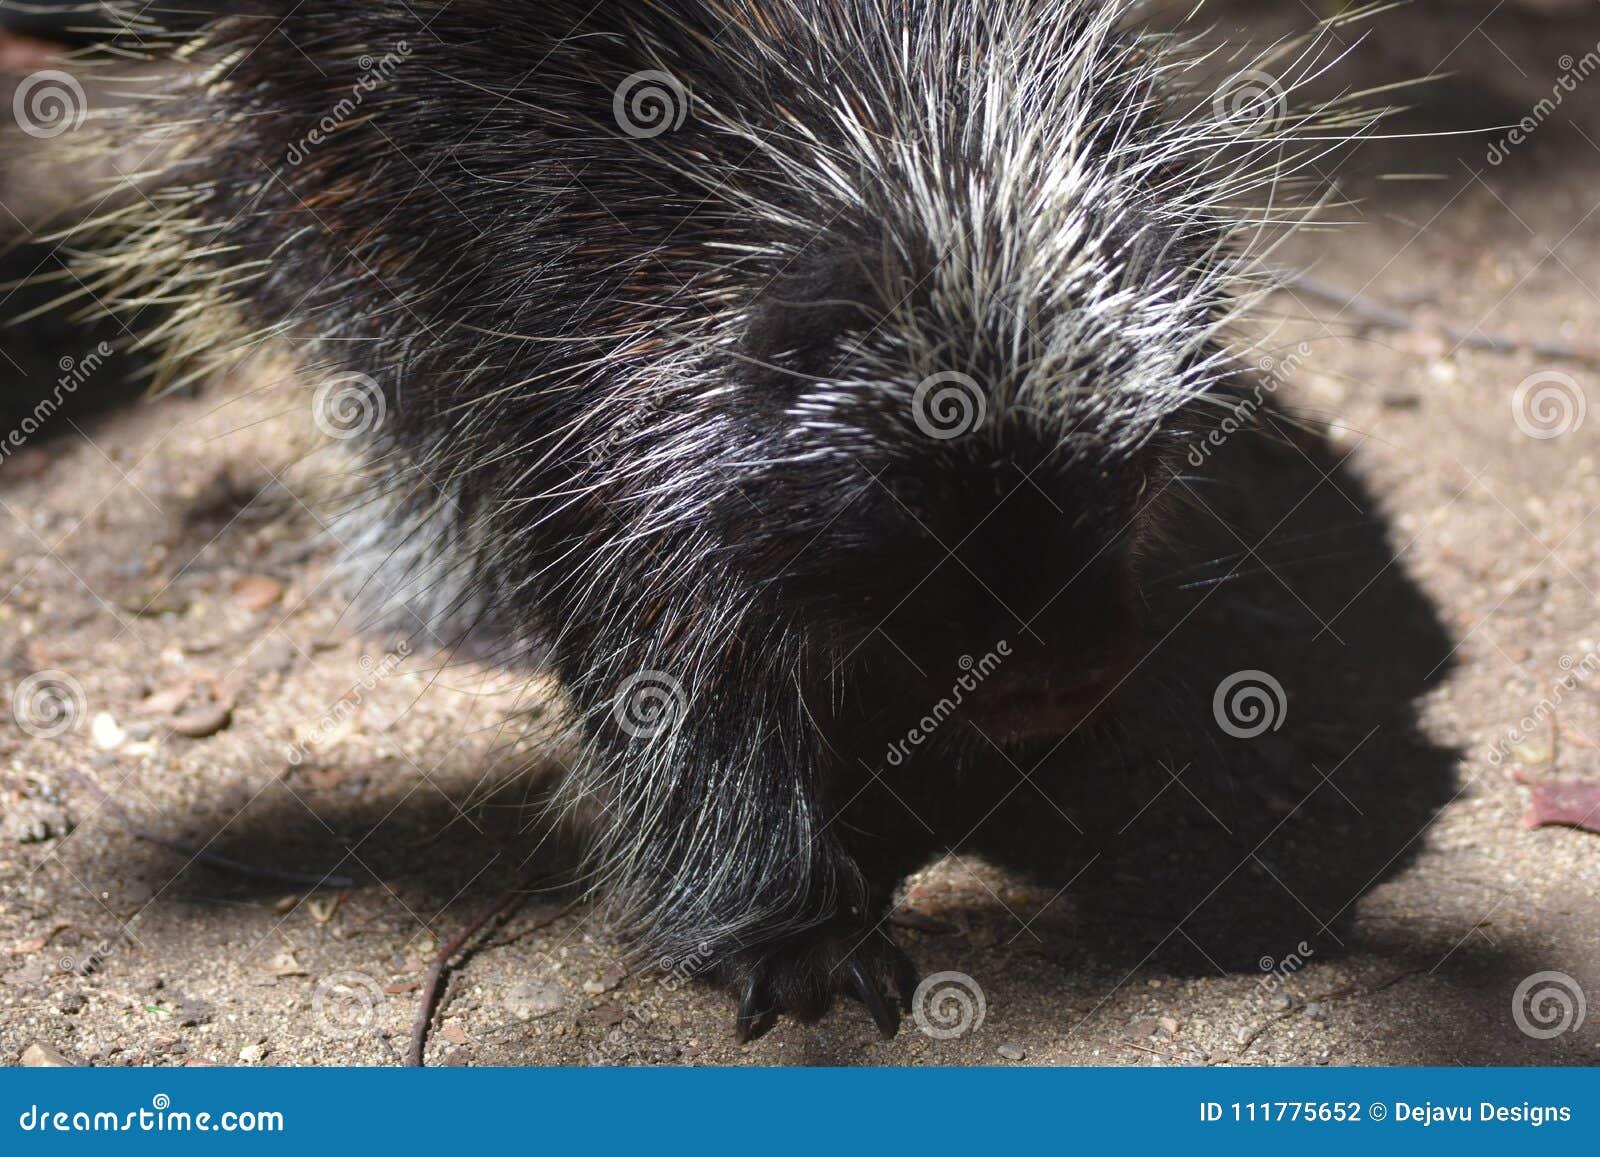 Close up photo of a black porcupine walking